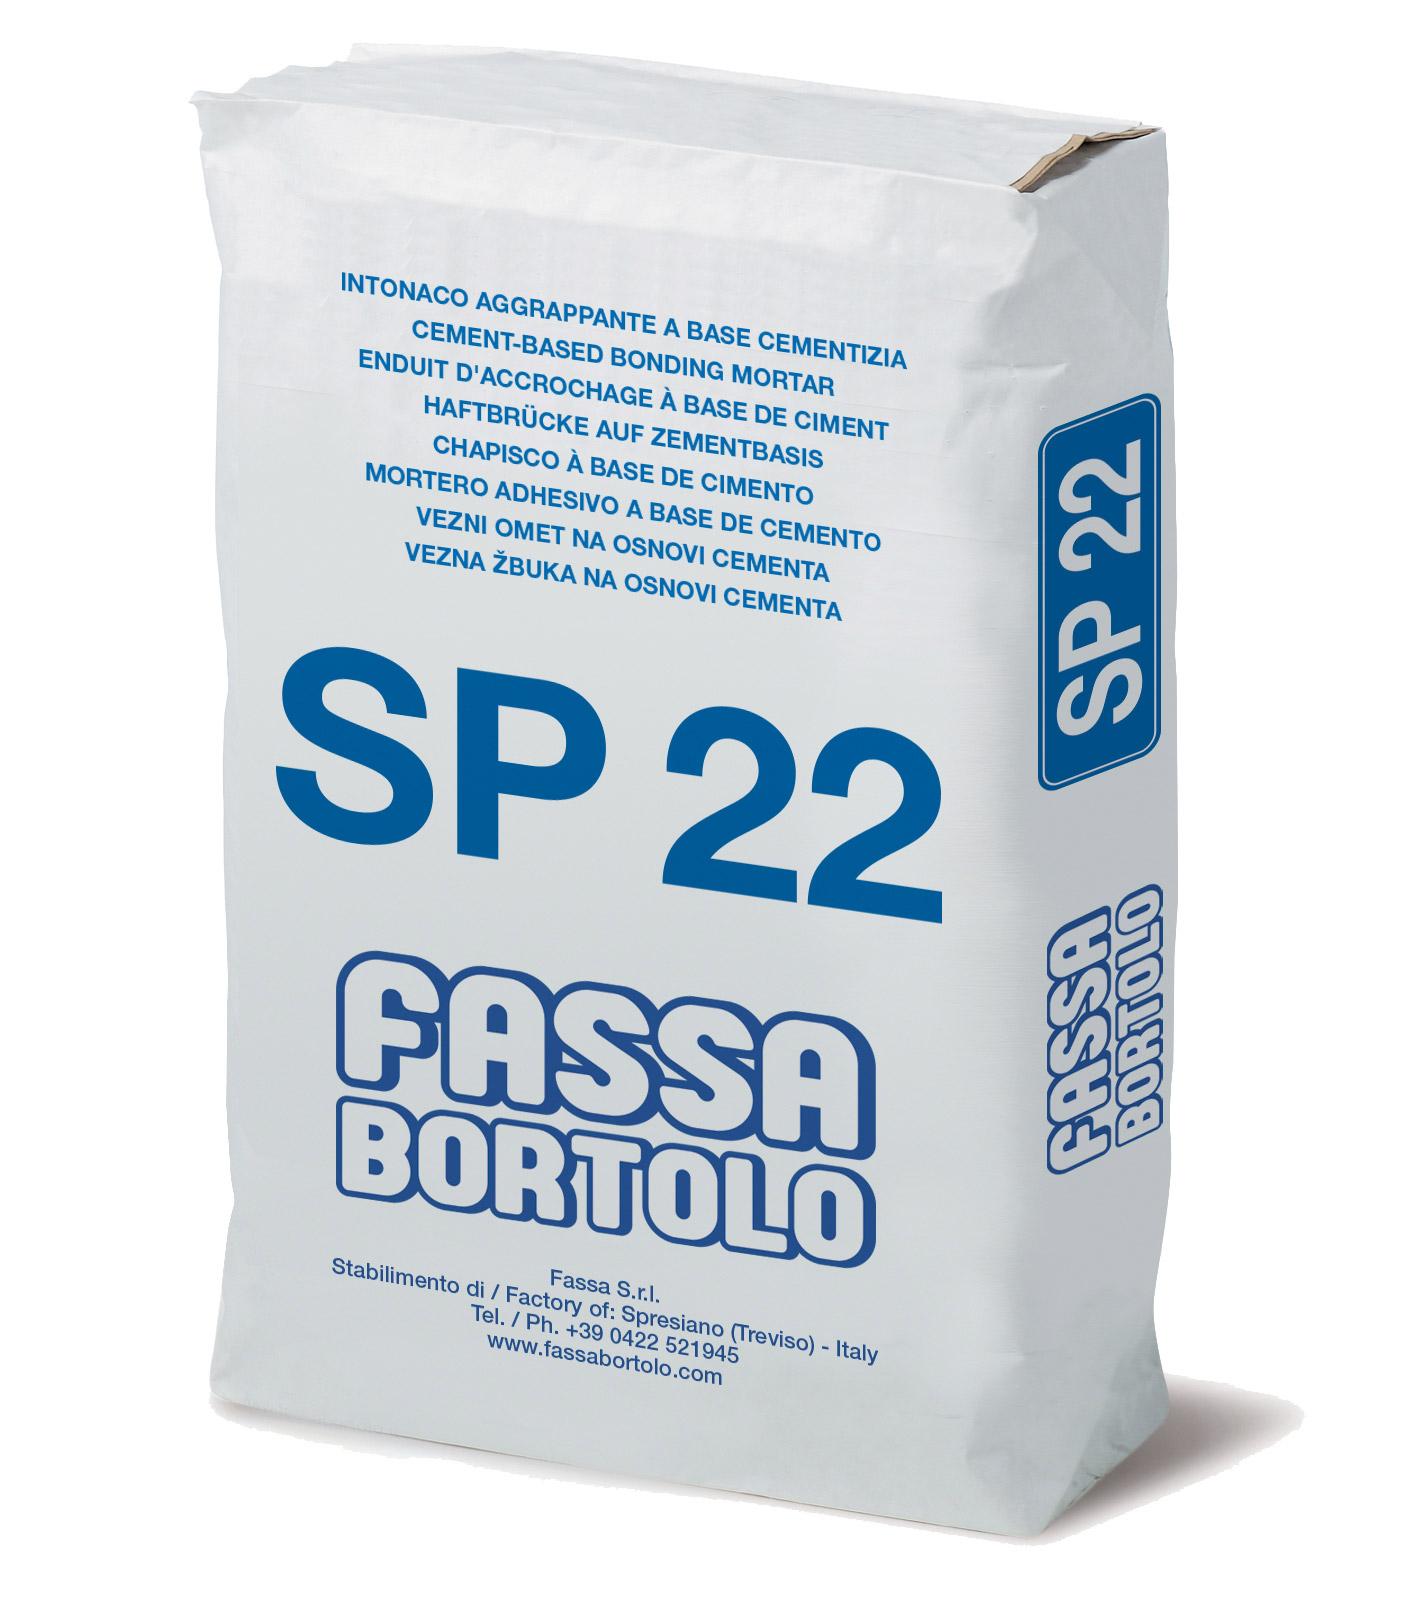 SP 22